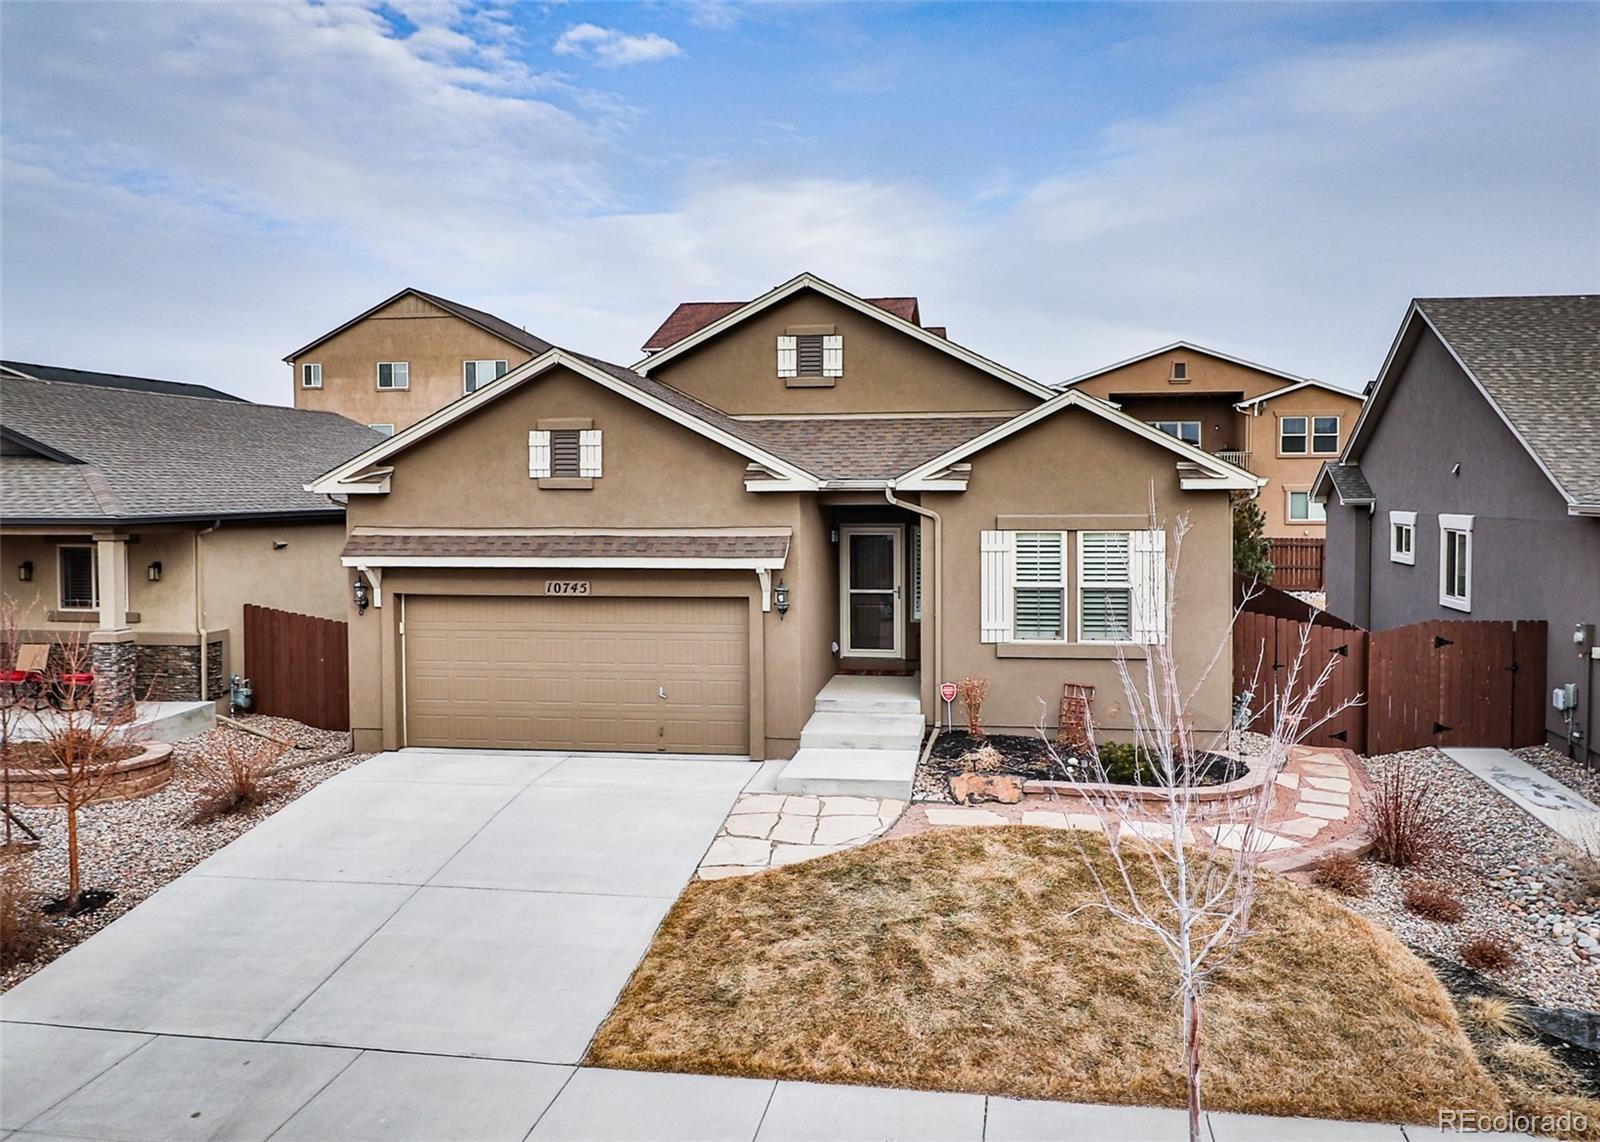 MLS# 2985288 - 1 - 10745 Echo Canyon Drive, Colorado Springs, CO 80908